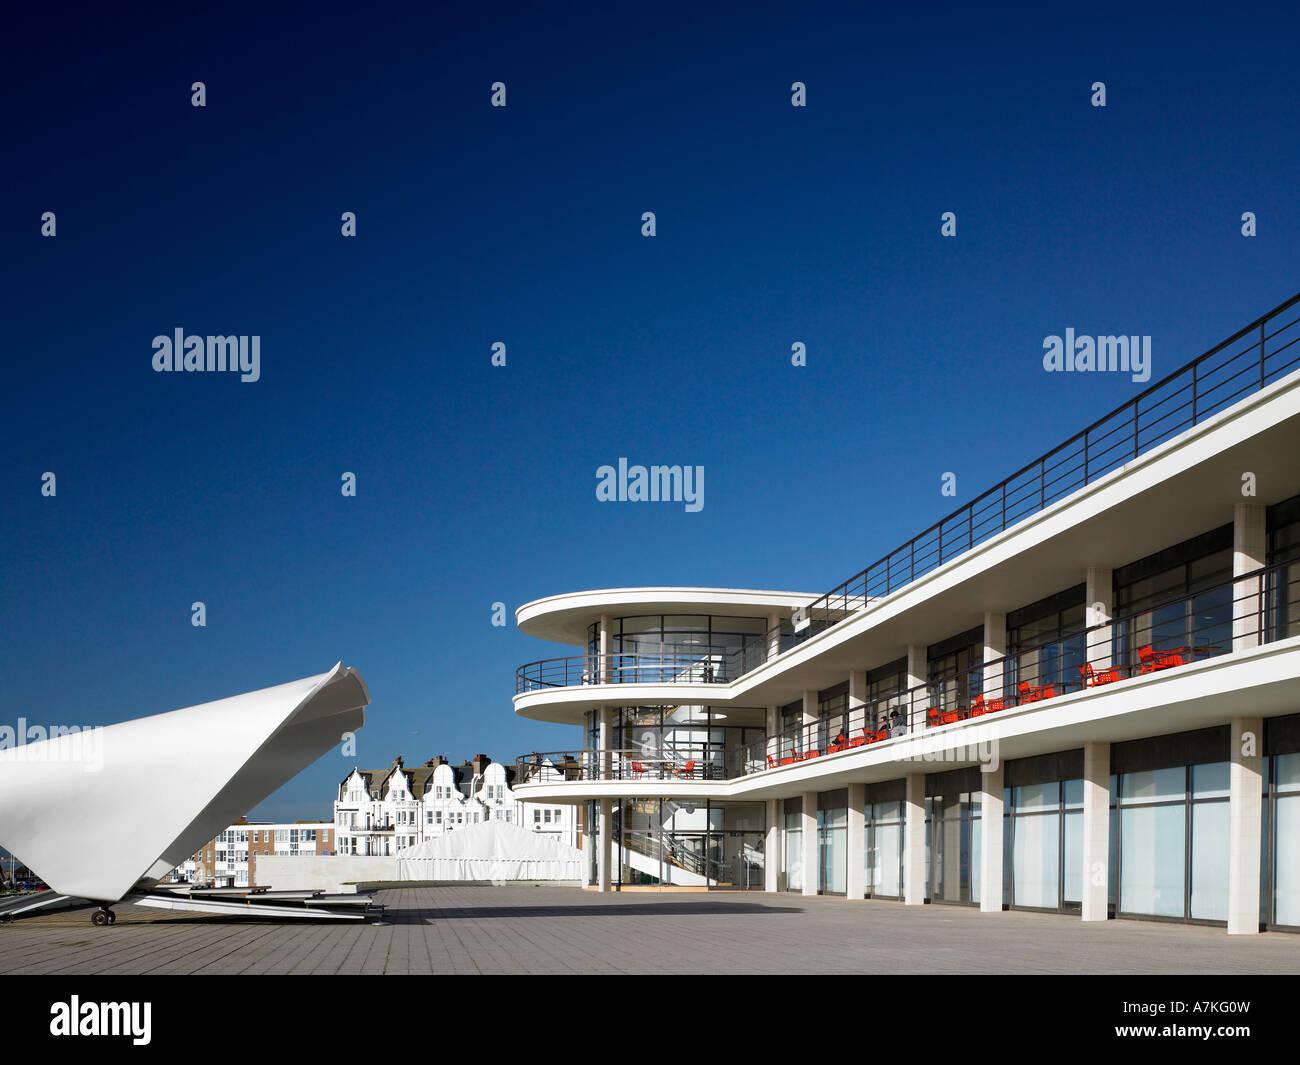 De La Warr Pavilion, Bexhill on Sea, East Sussex. 1935 Architect: Erich Mendelsohn and Serge Chermayeff - Stock Image